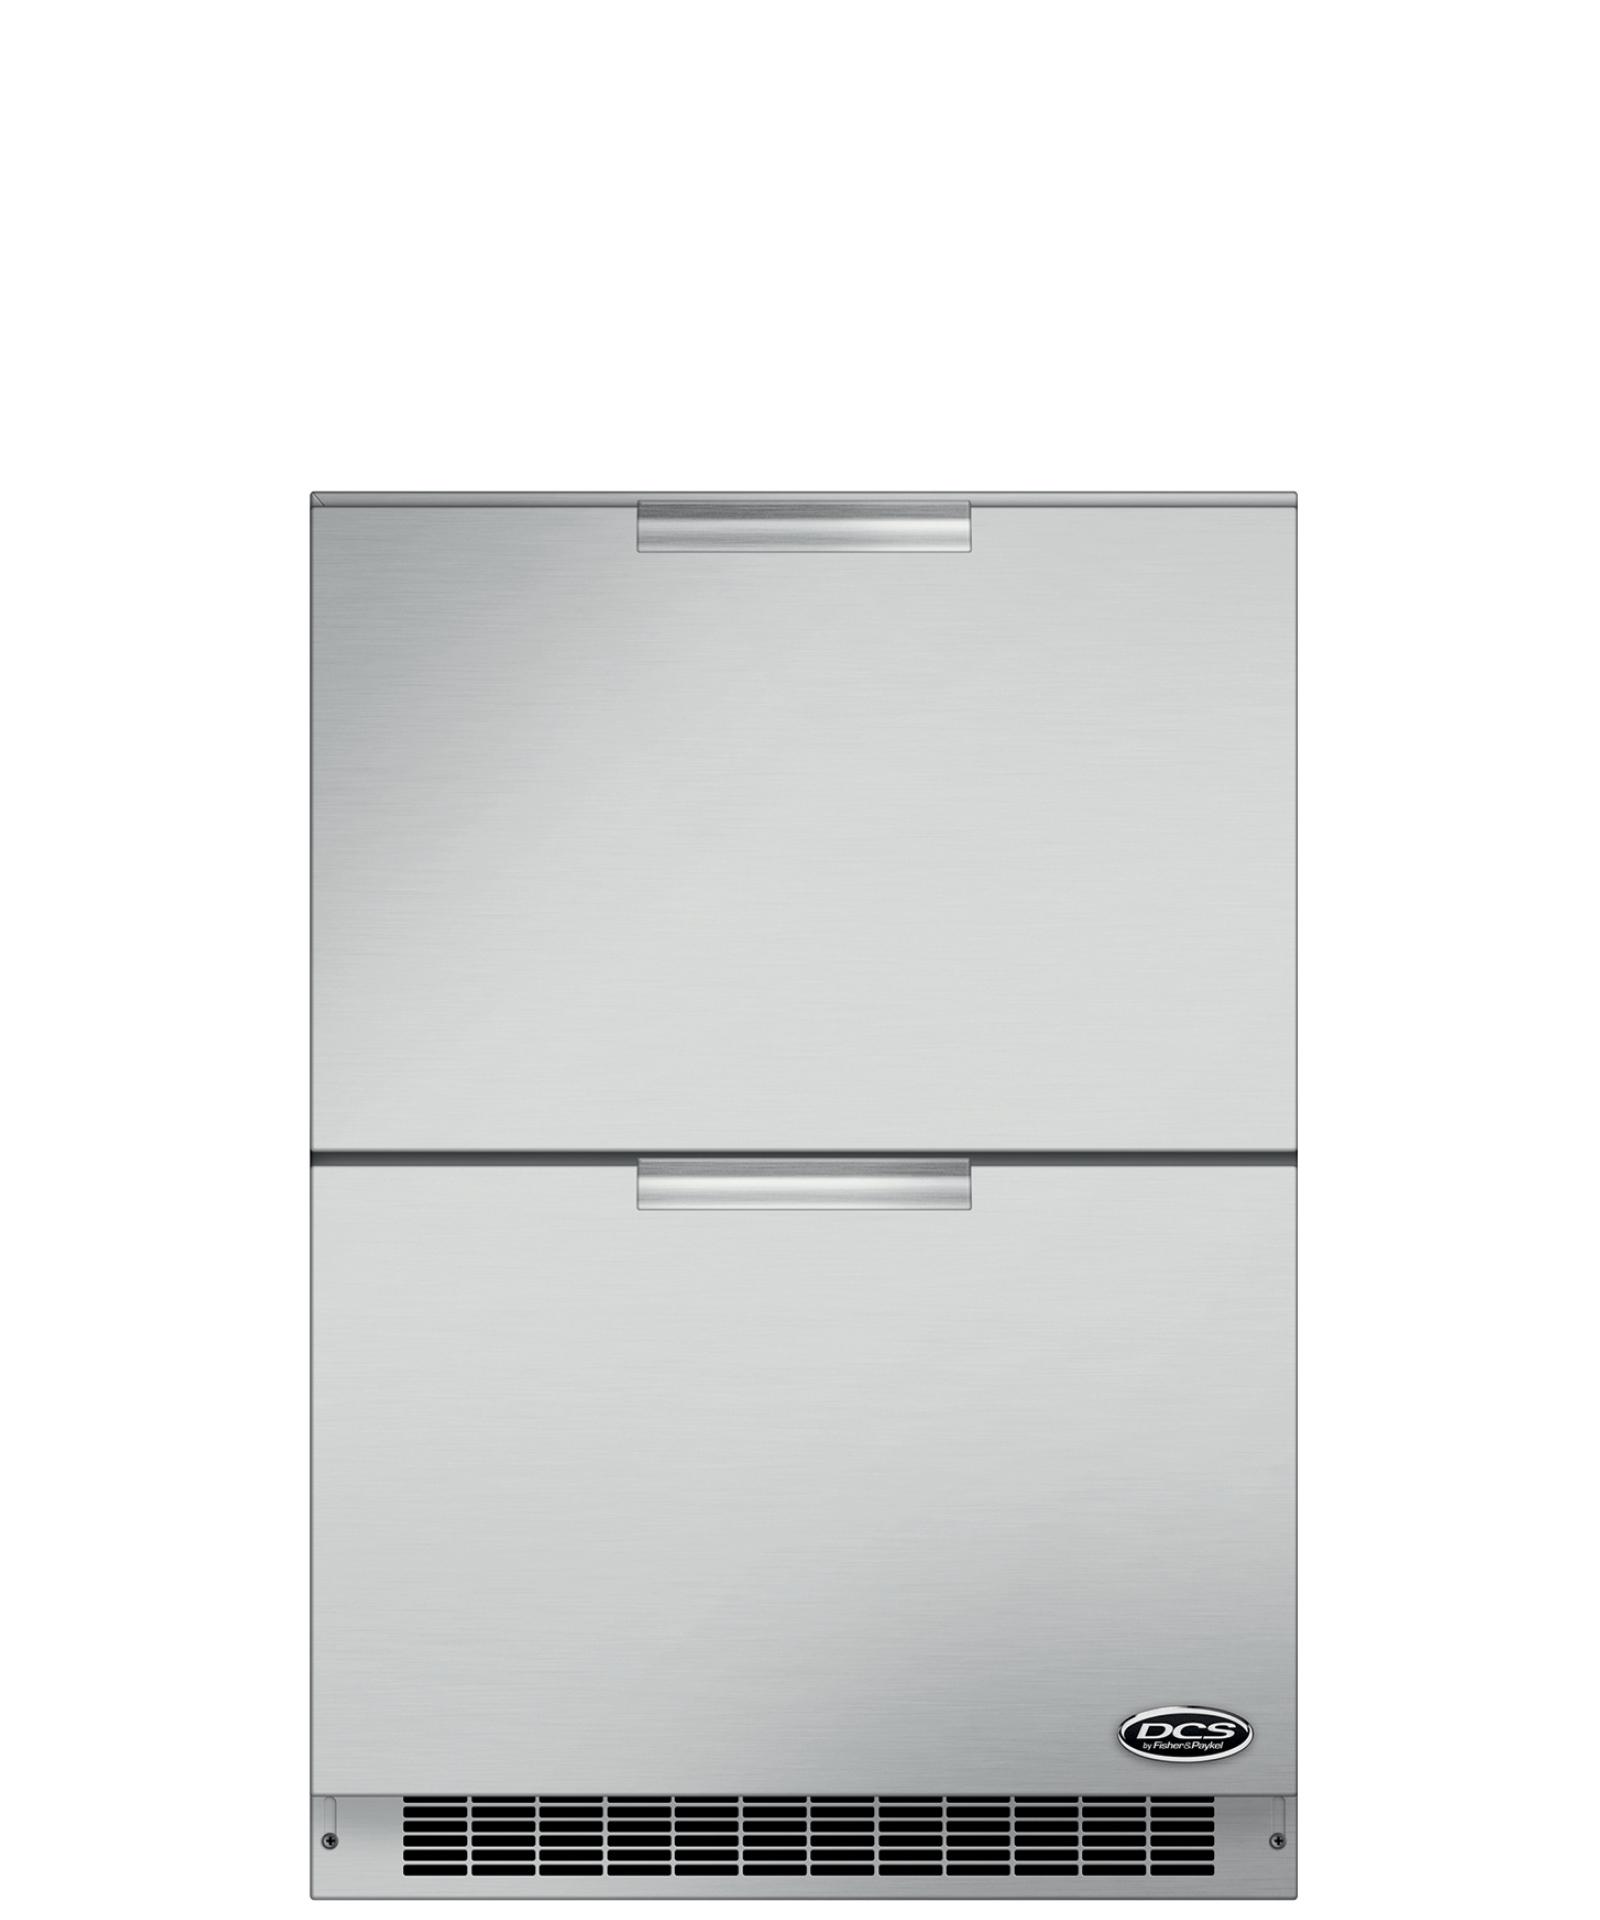 "DCS 24"" Outdoor Refrigerator Drawers"